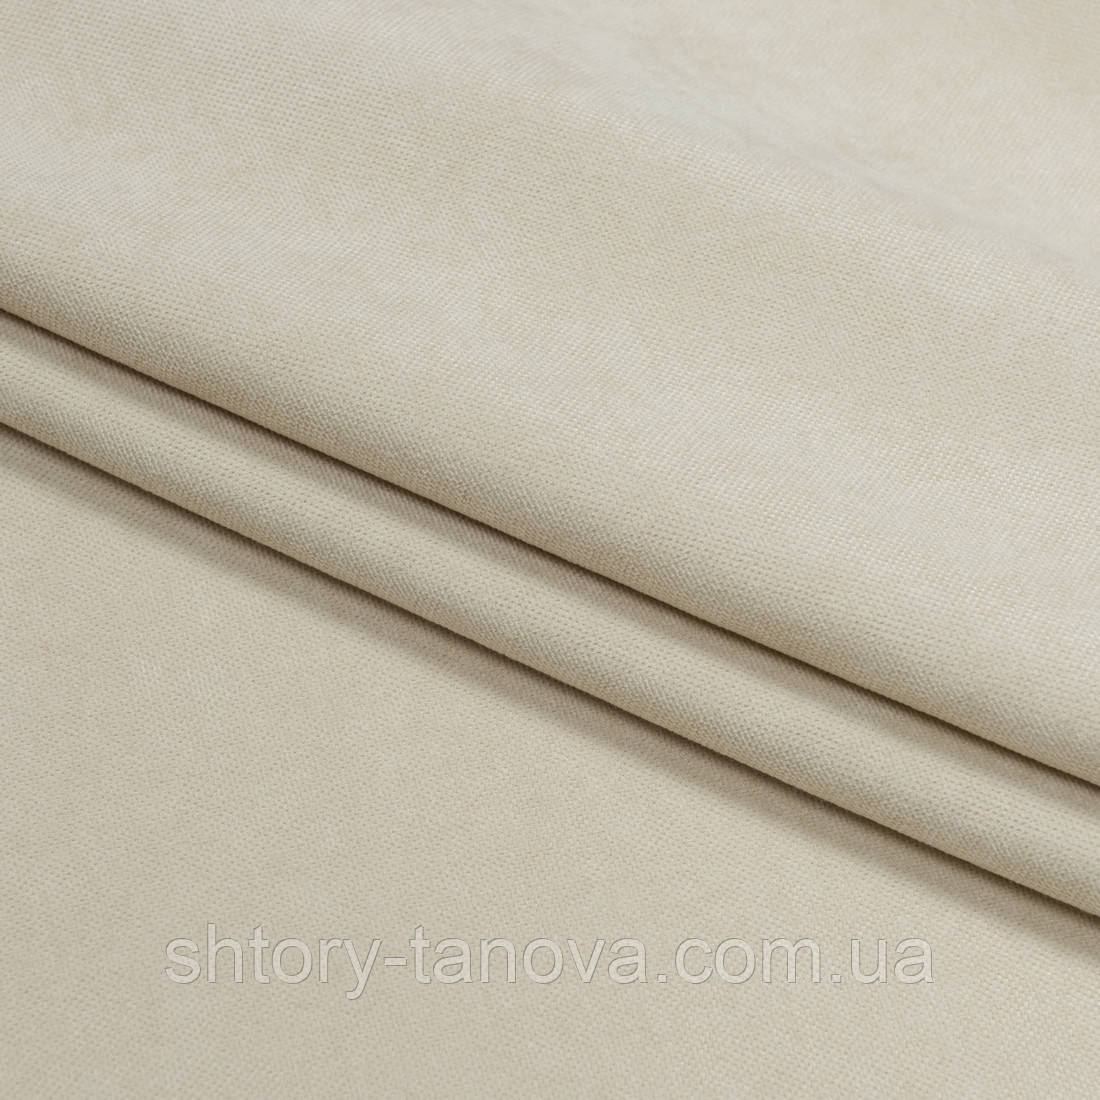 Нубук ткань для штор  крем-брюле